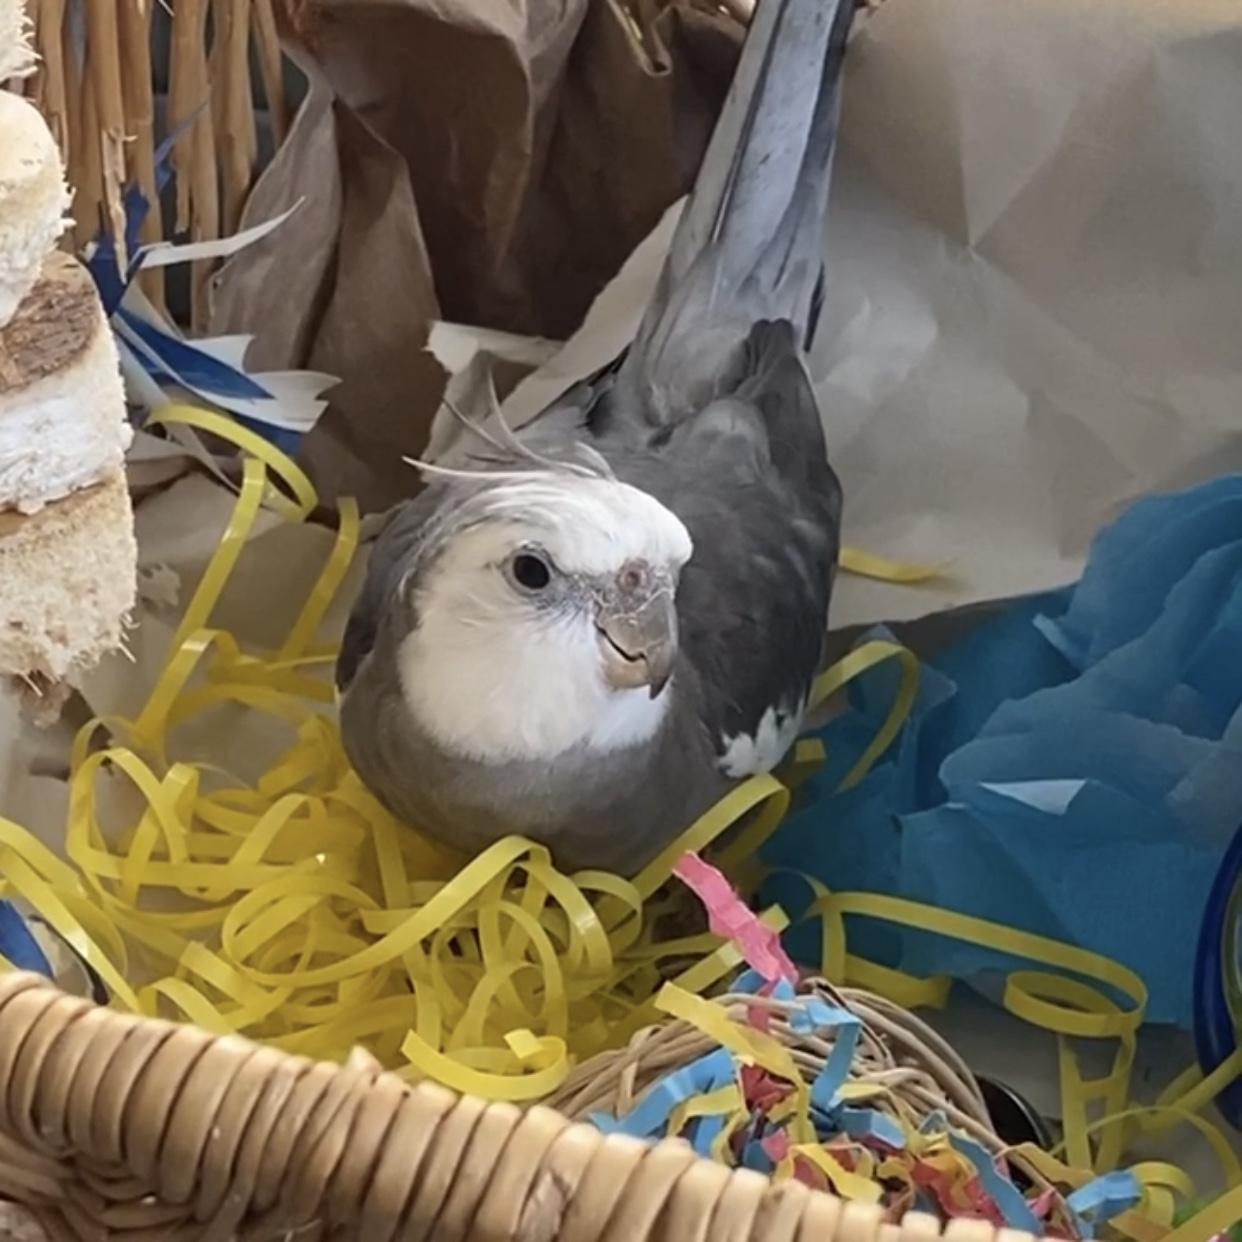 cockatiel nesting in a basket